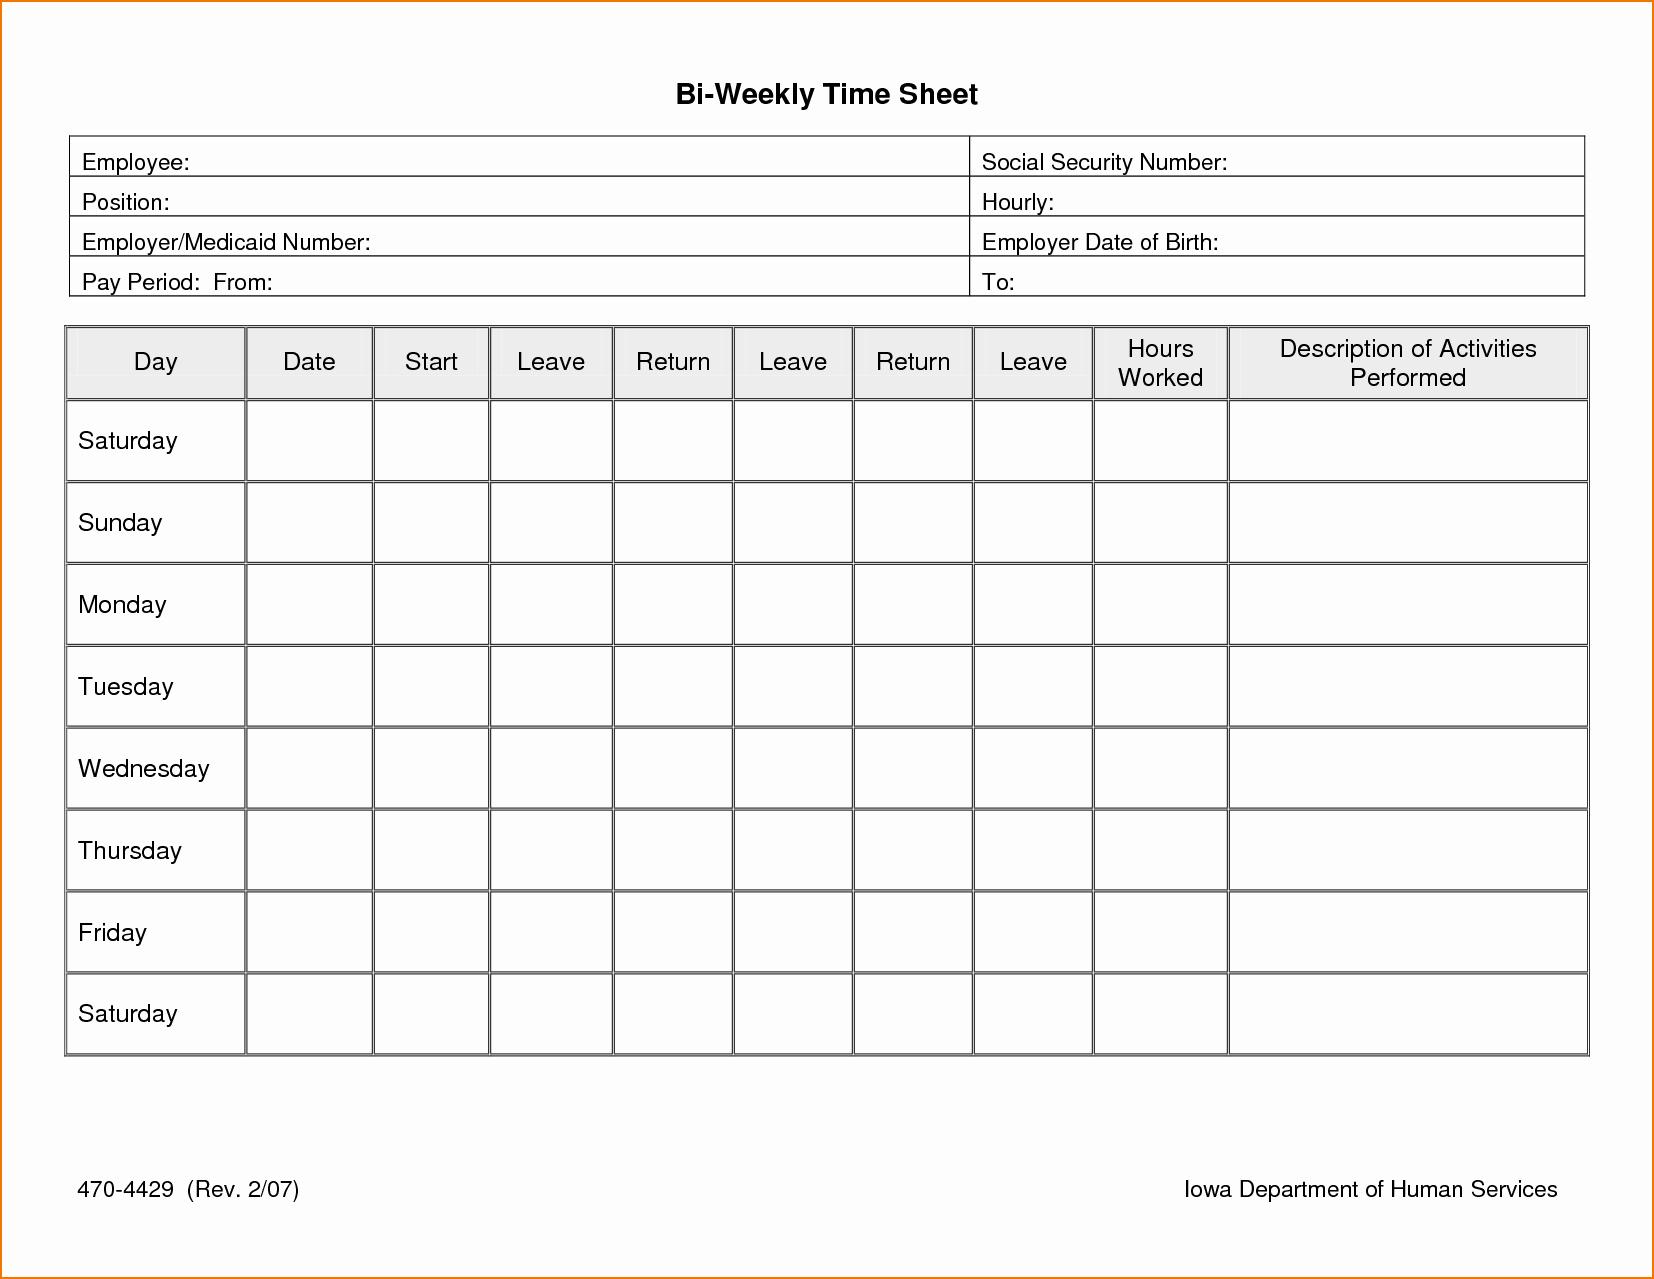 Wrench Time Study Spreadsheet Inside Time Study Spreadsheet  Aljererlotgd